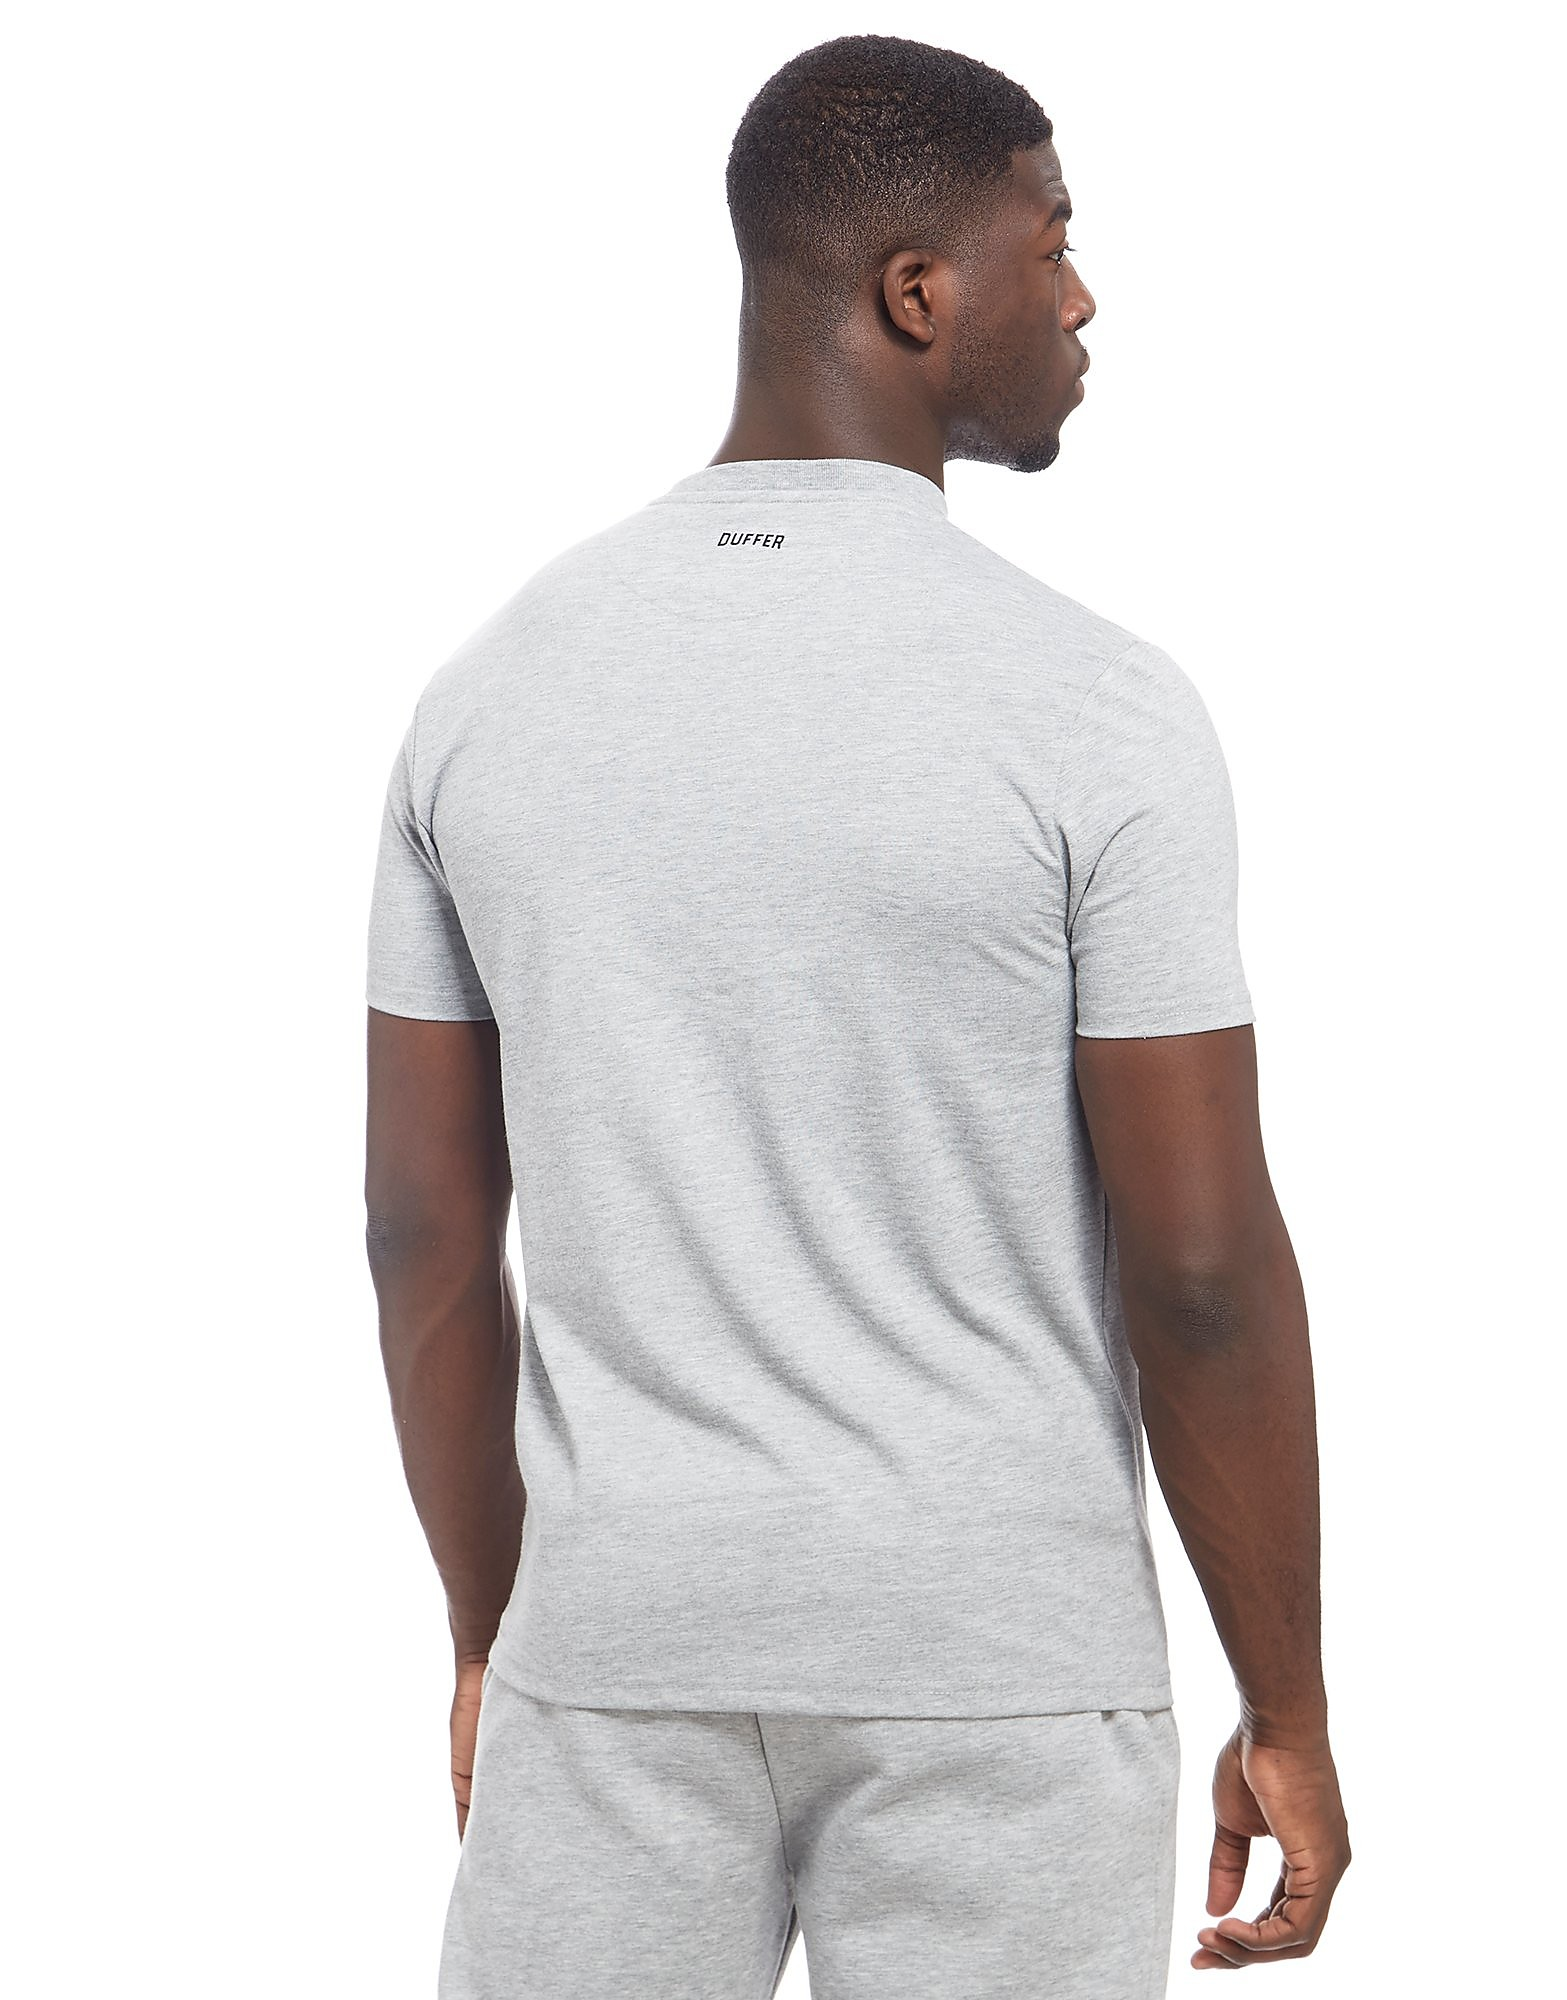 Duffer of St George Blenheim T-Shirt